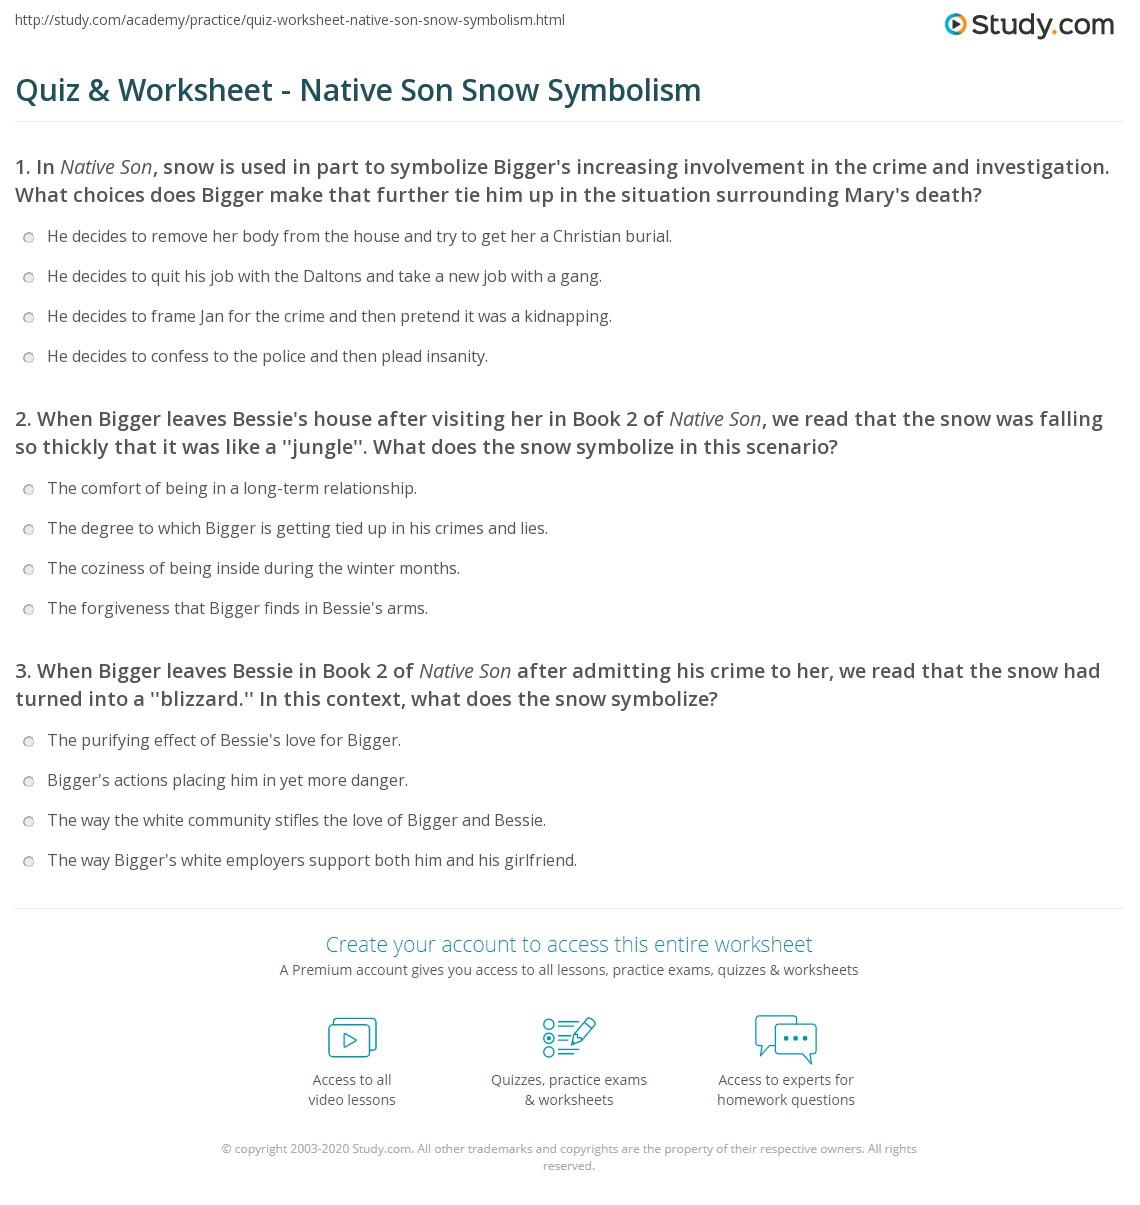 Quiz Worksheet Native Son Snow Symbolism Study